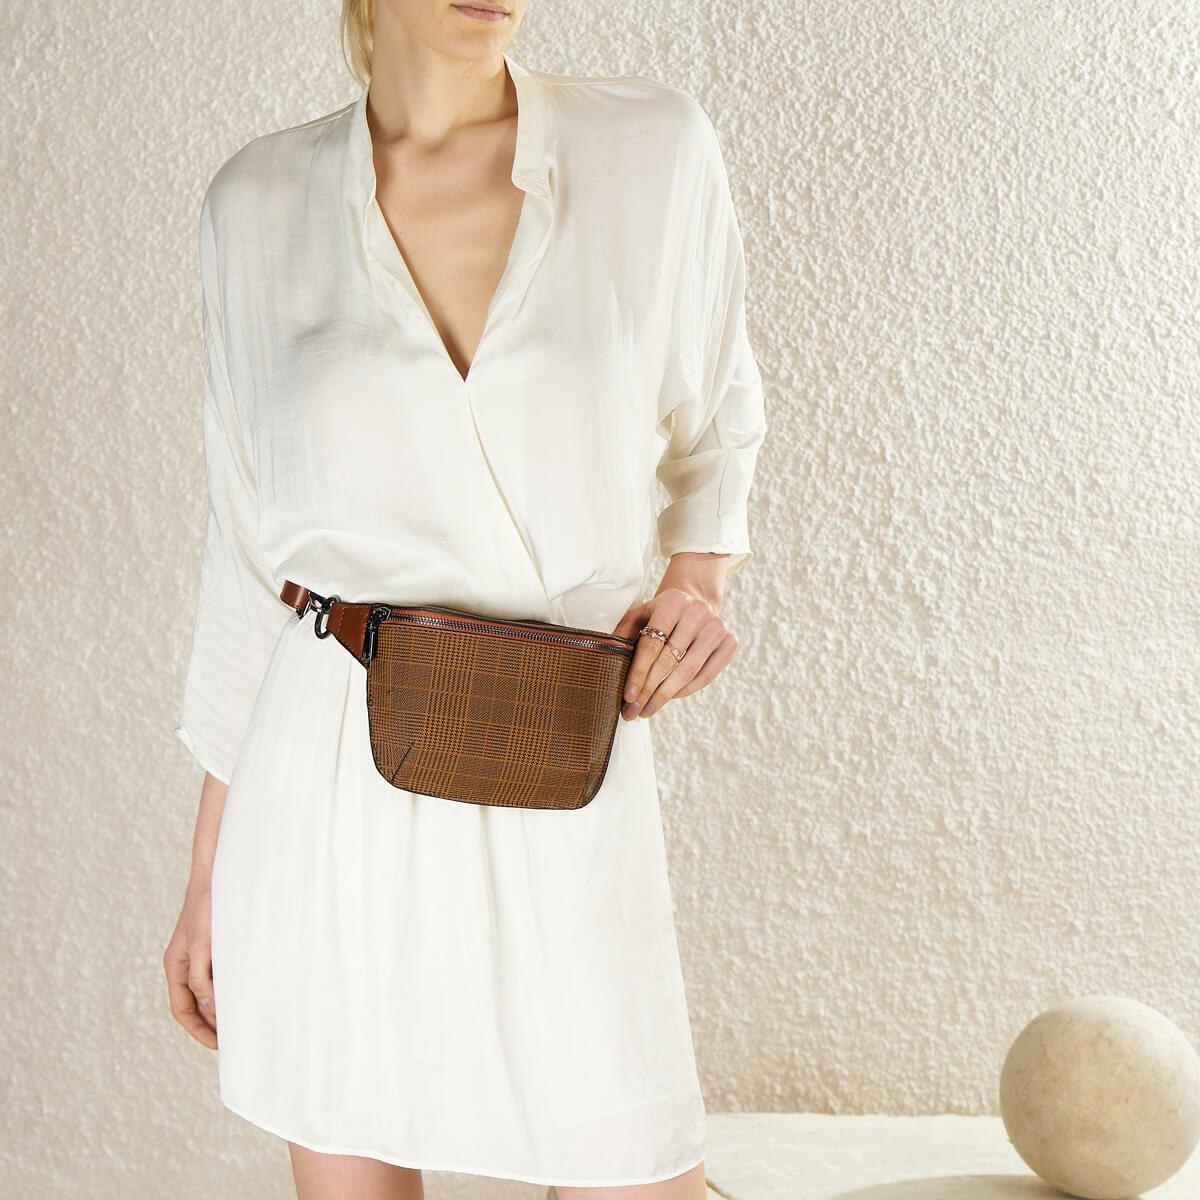 FLO TMK19033 17Z Tan Women 'S Waist Bag BUTIGO